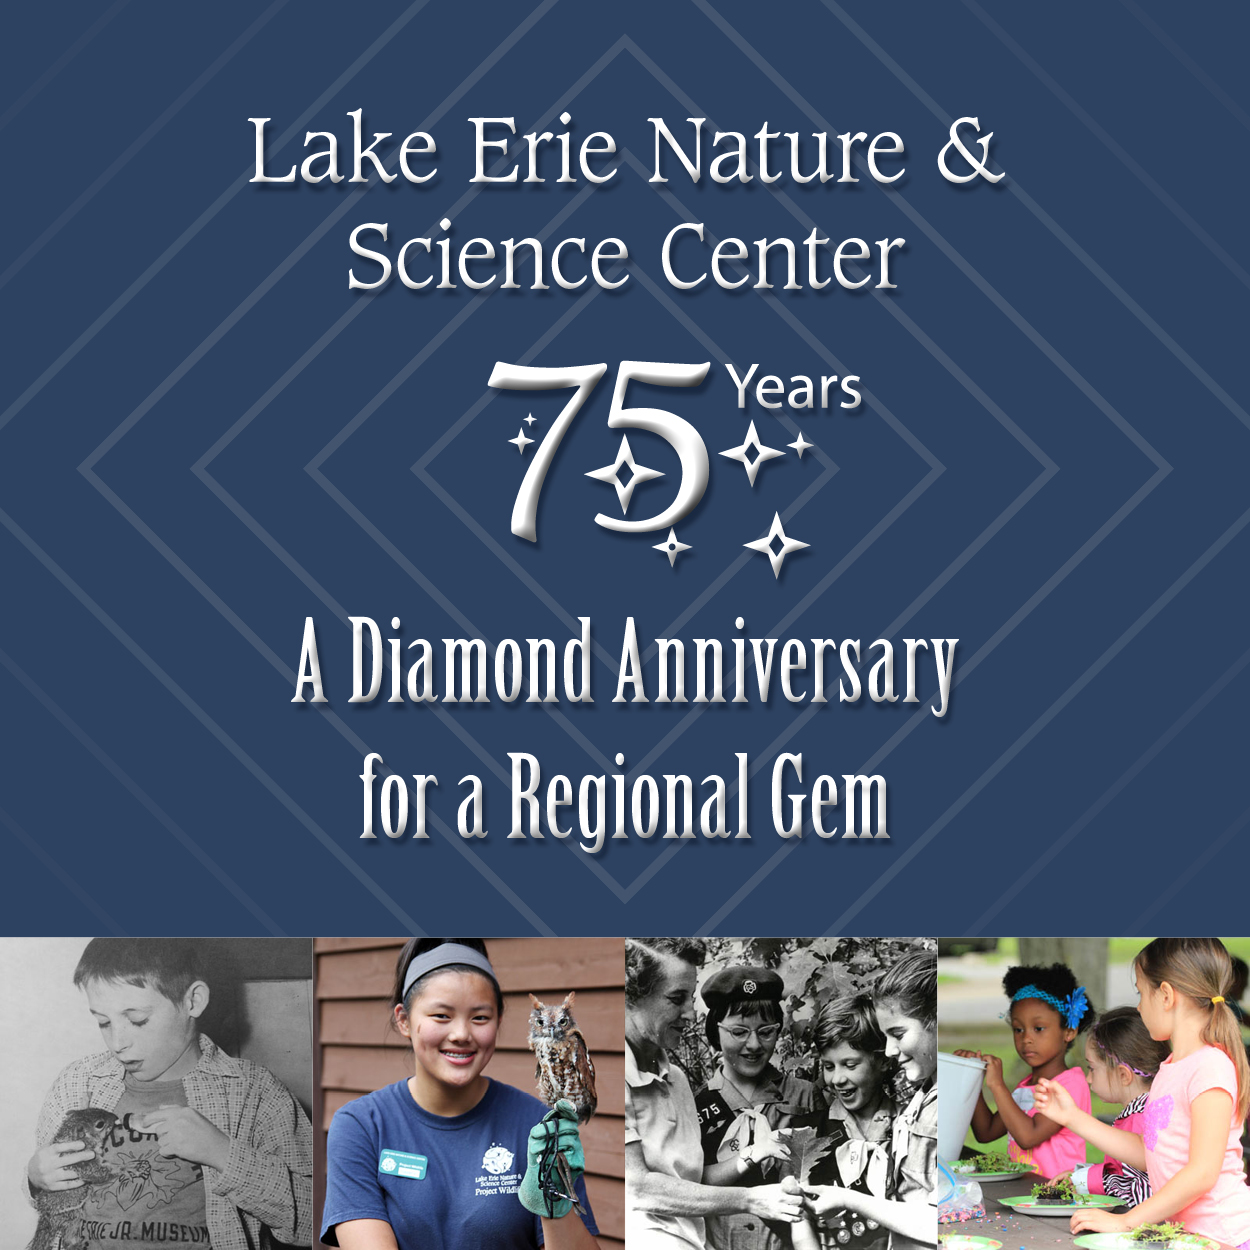 A Diamond Anniversary for a Regional Gem